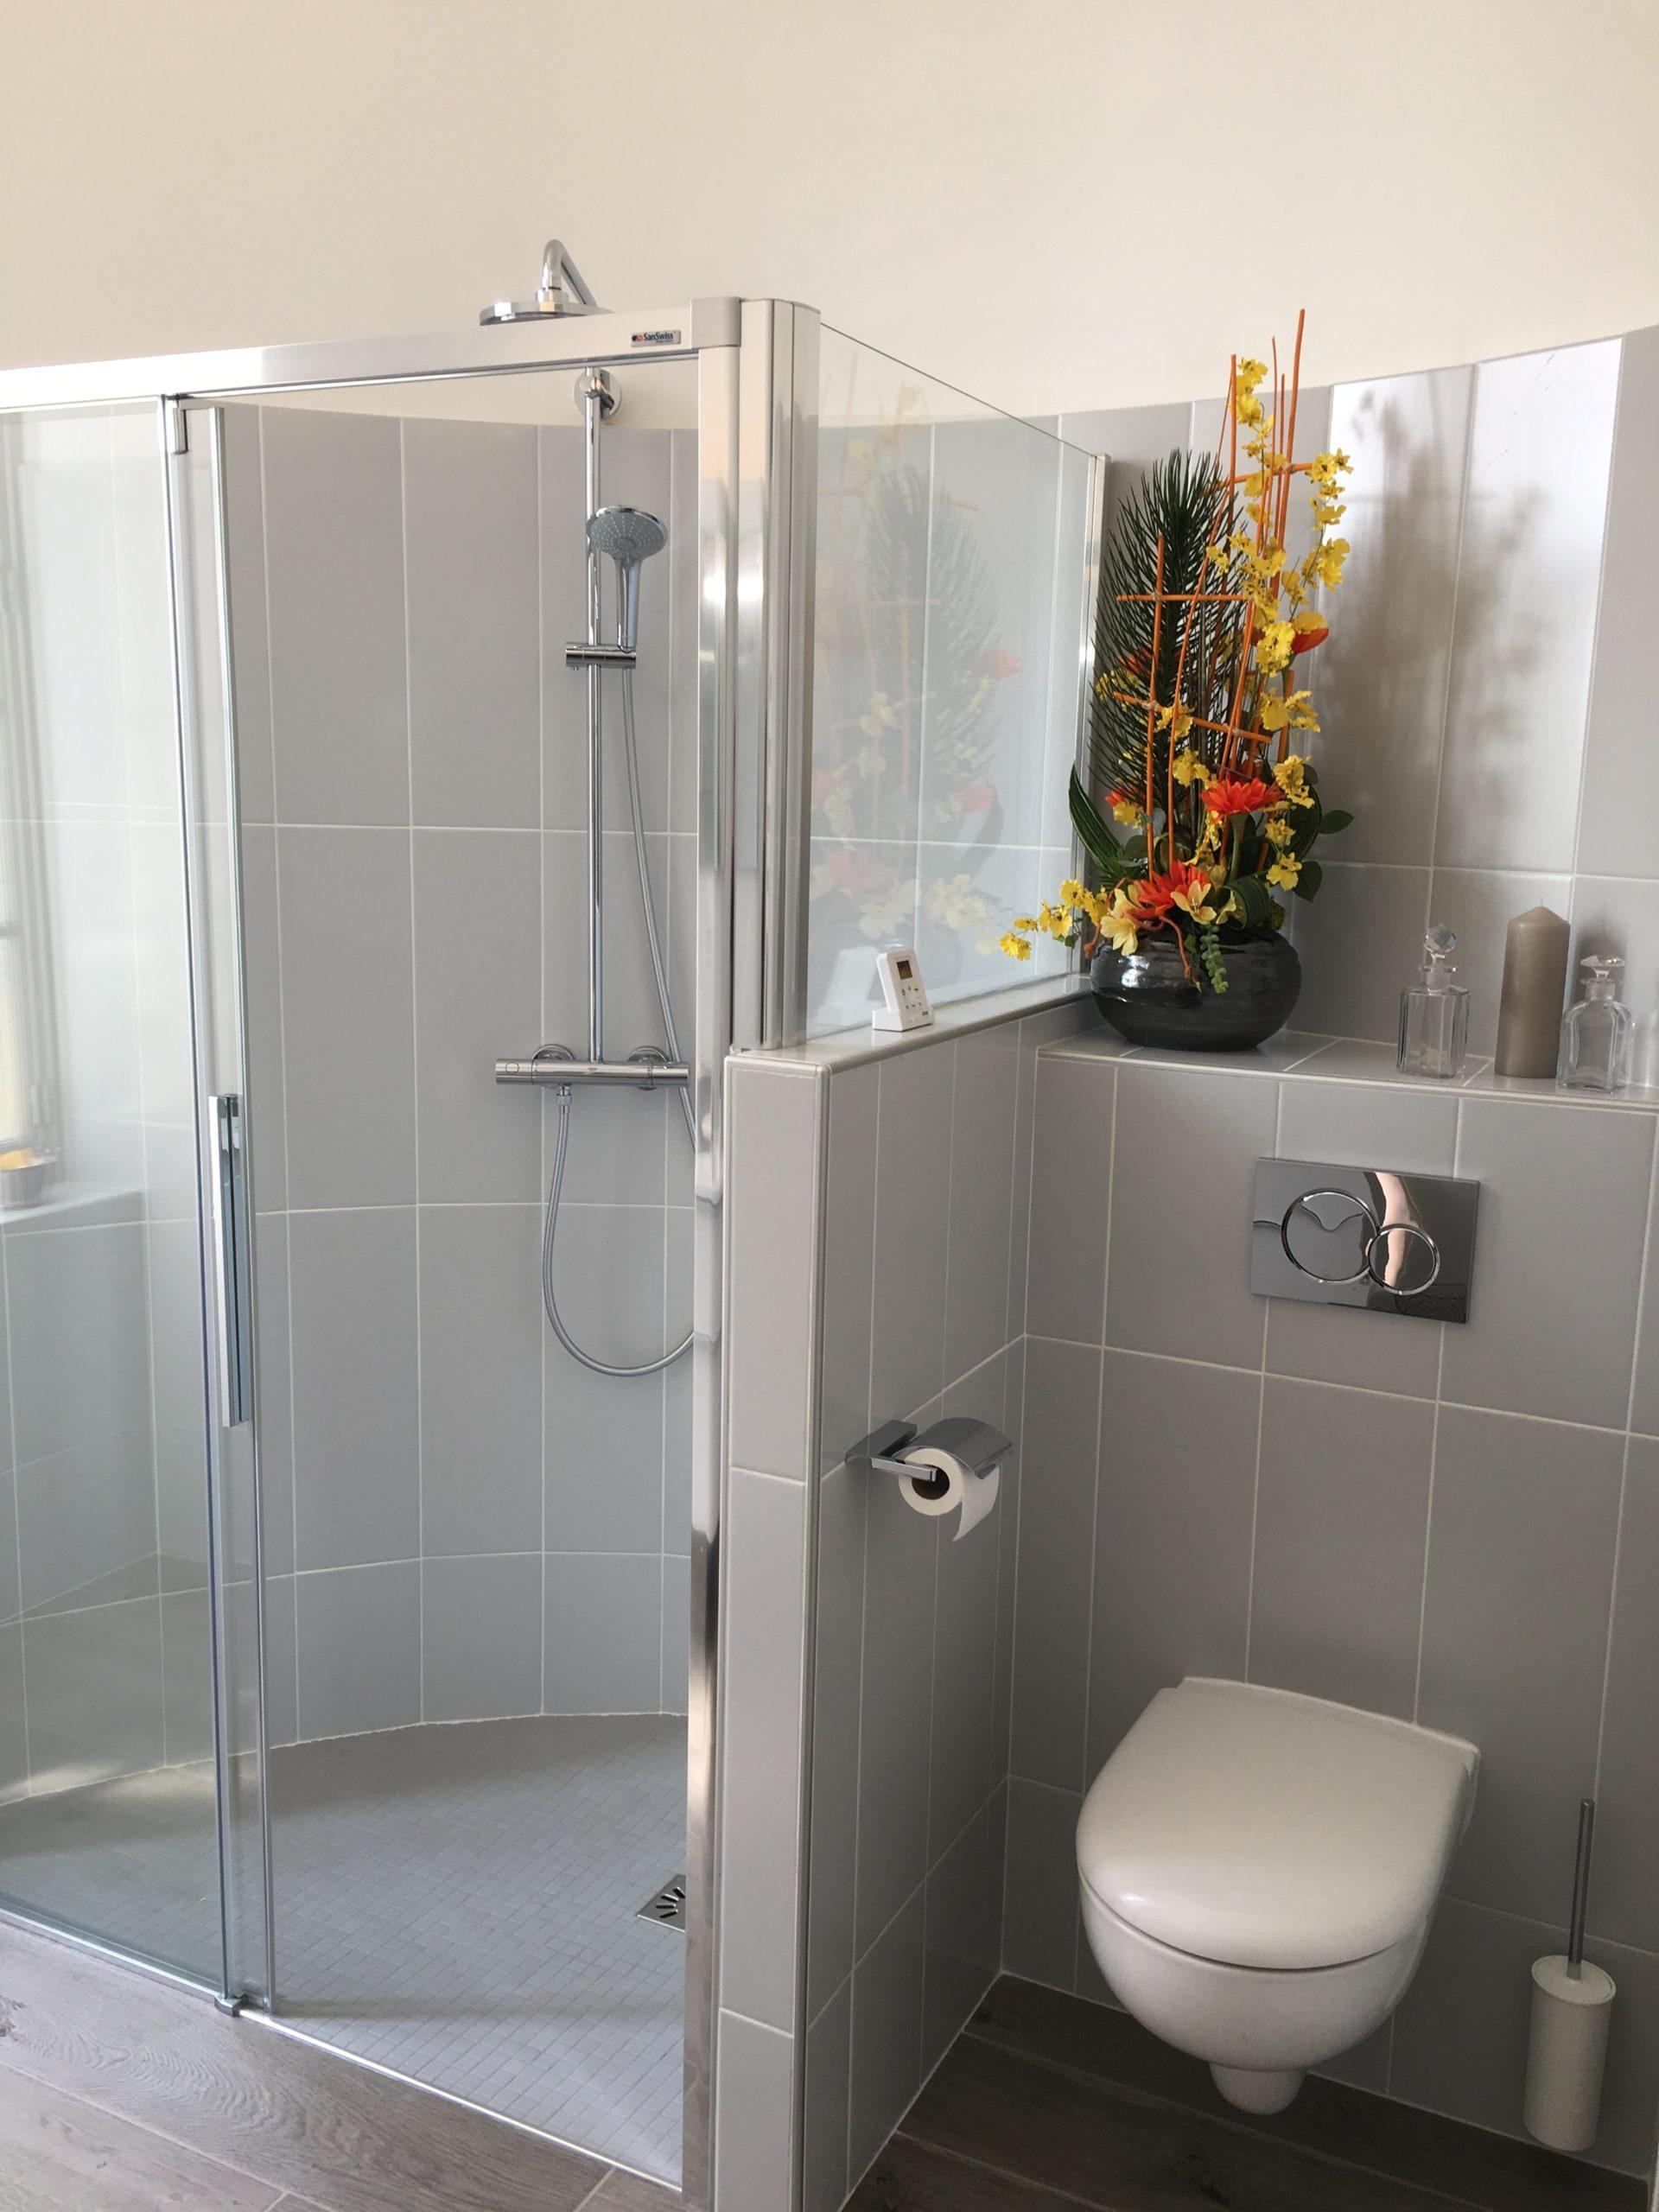 salle bain scandinave bois minimaliste douche sanitaire